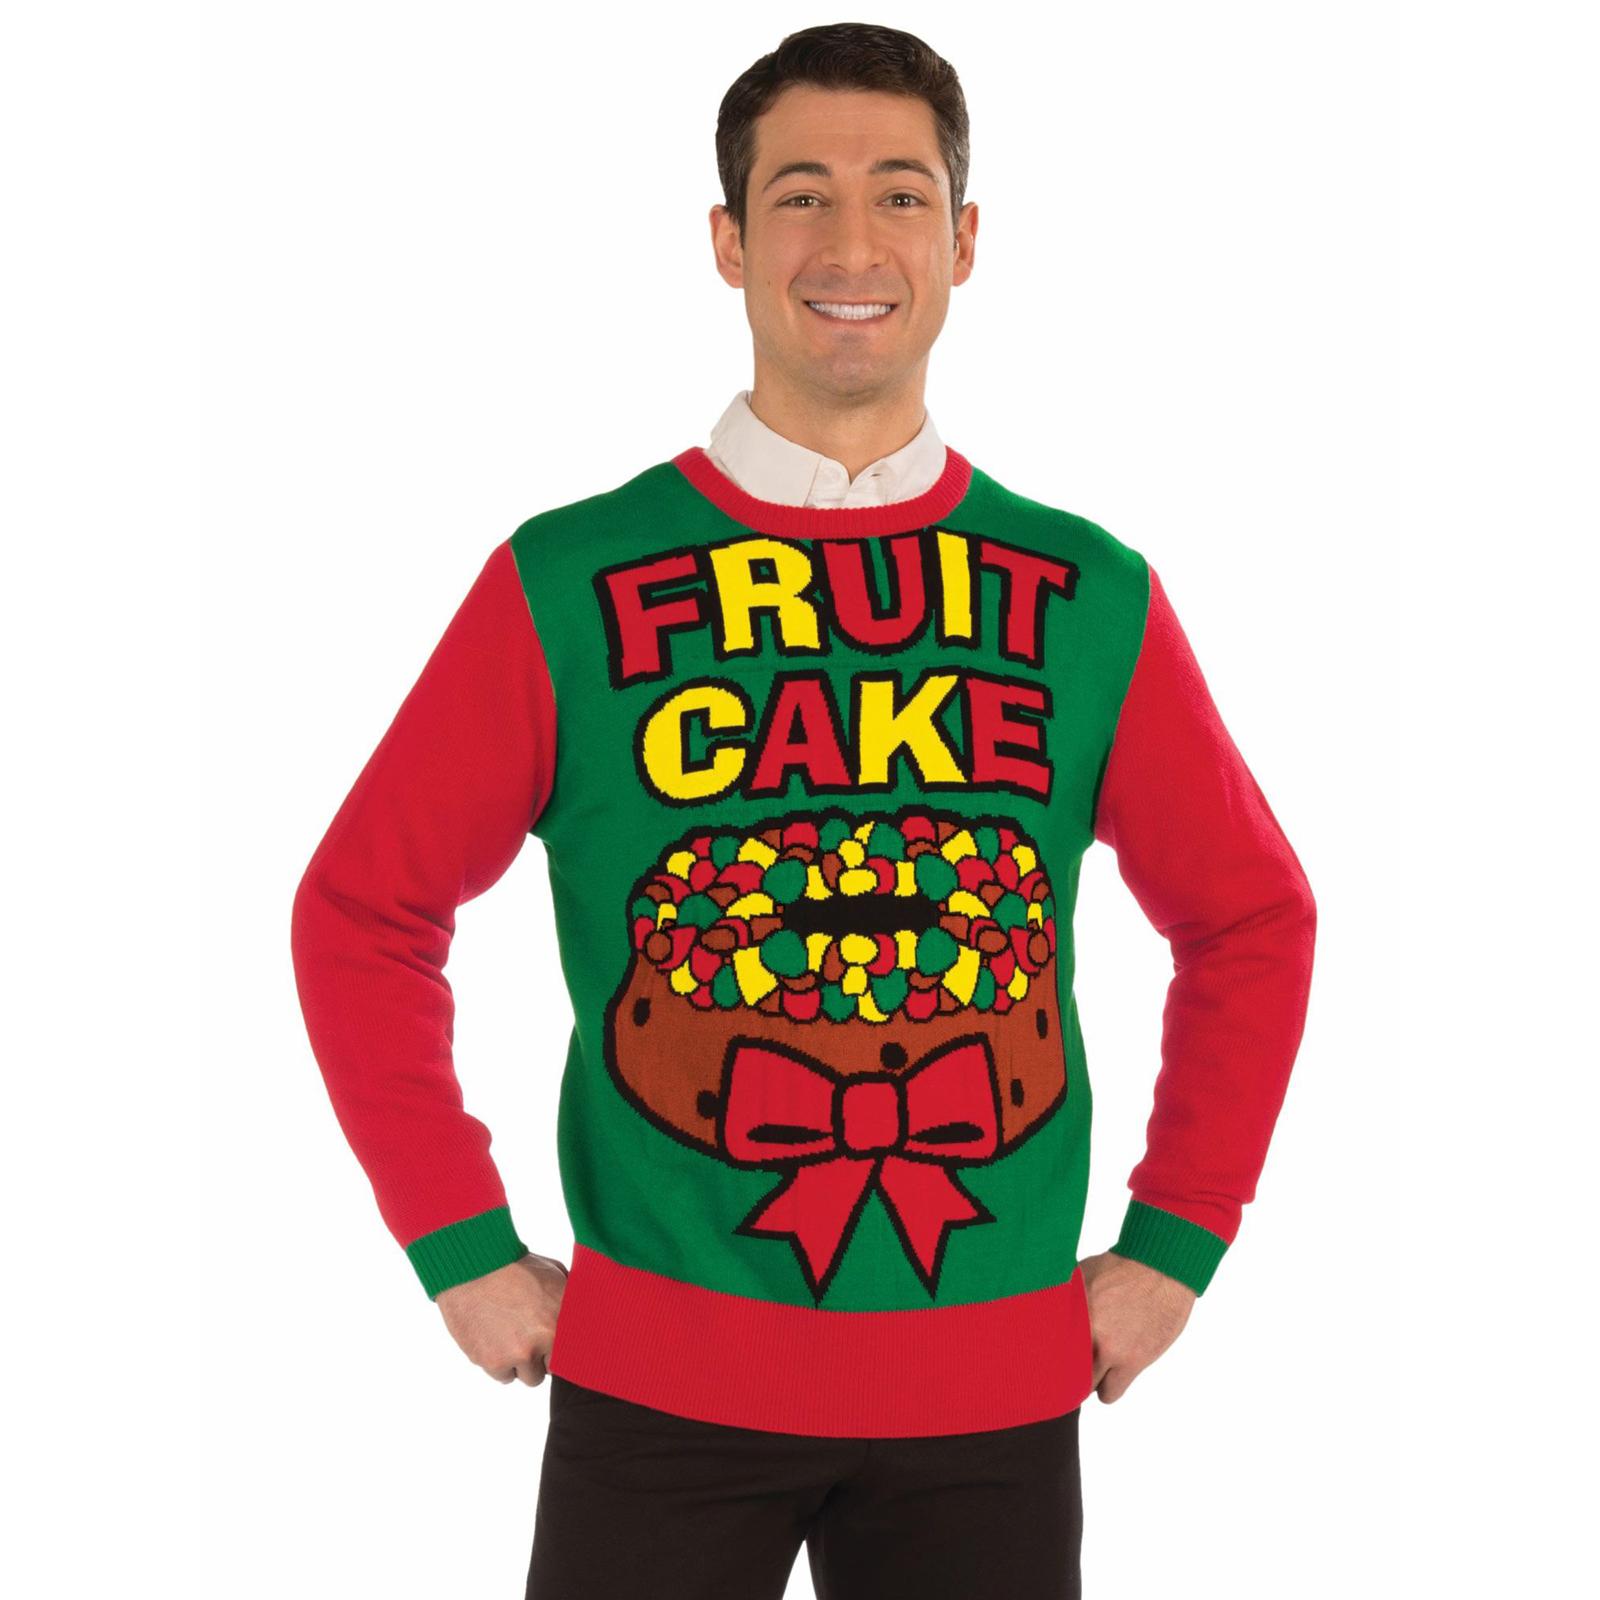 Fruit Cake Adult Christmas Sweater   BuyCostumes.com